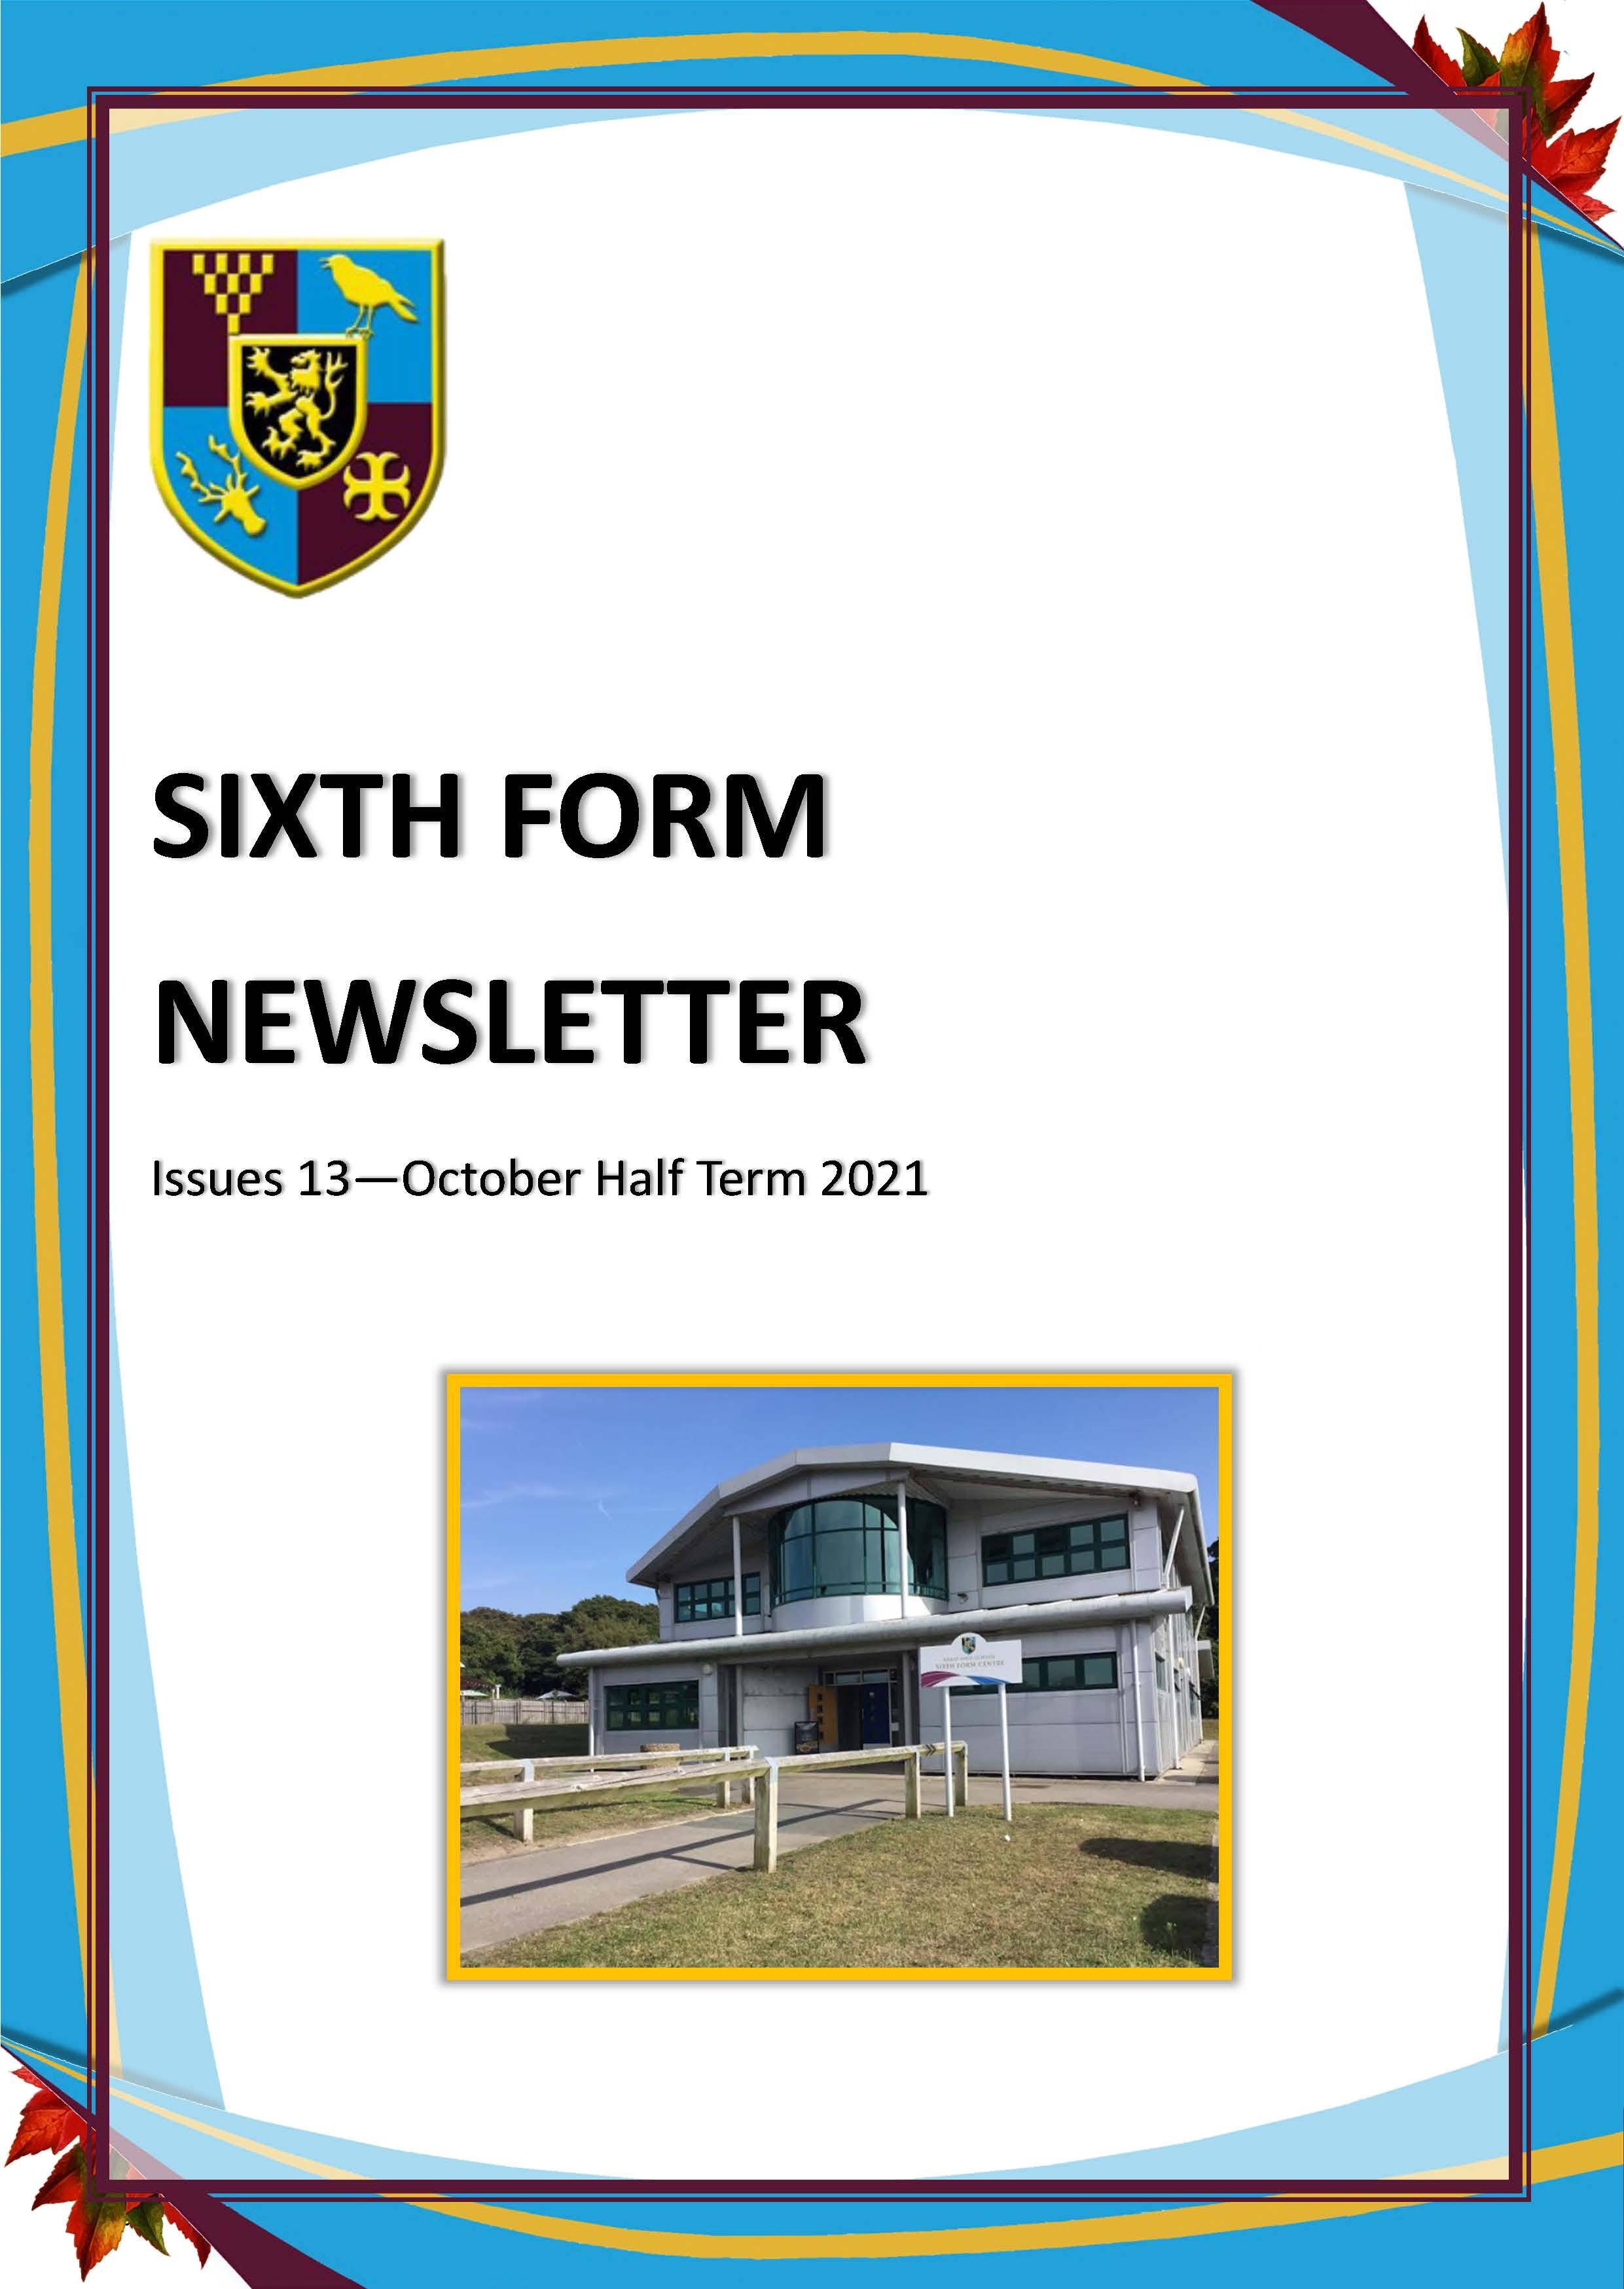 https://www.range.sefton.sch.uk/wp-content/uploads/2021/10/Sixth-Form-Newsletter-October-2021_Page_1.jpg